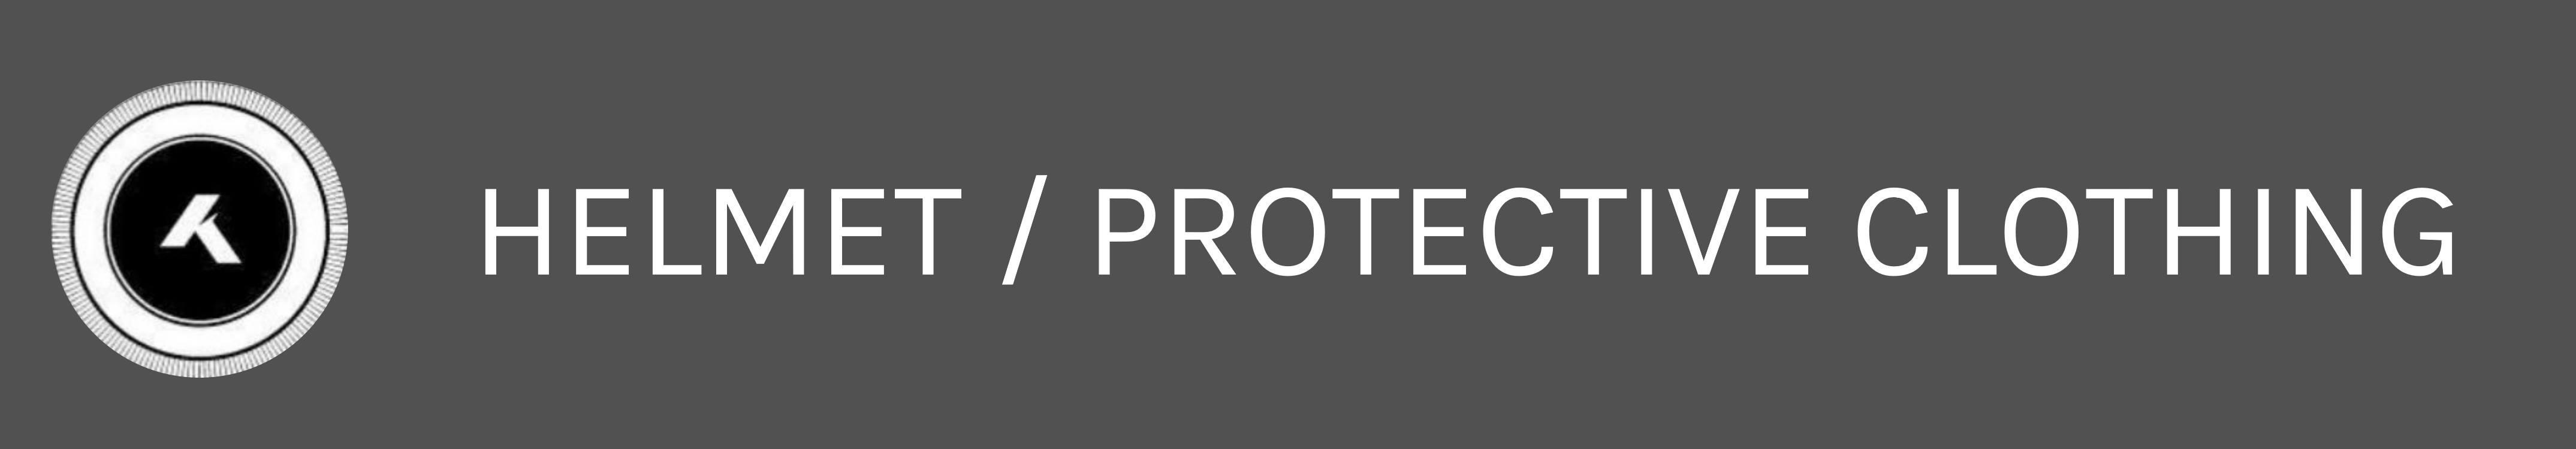 KHE-Banner-Helmet-protective-clothing